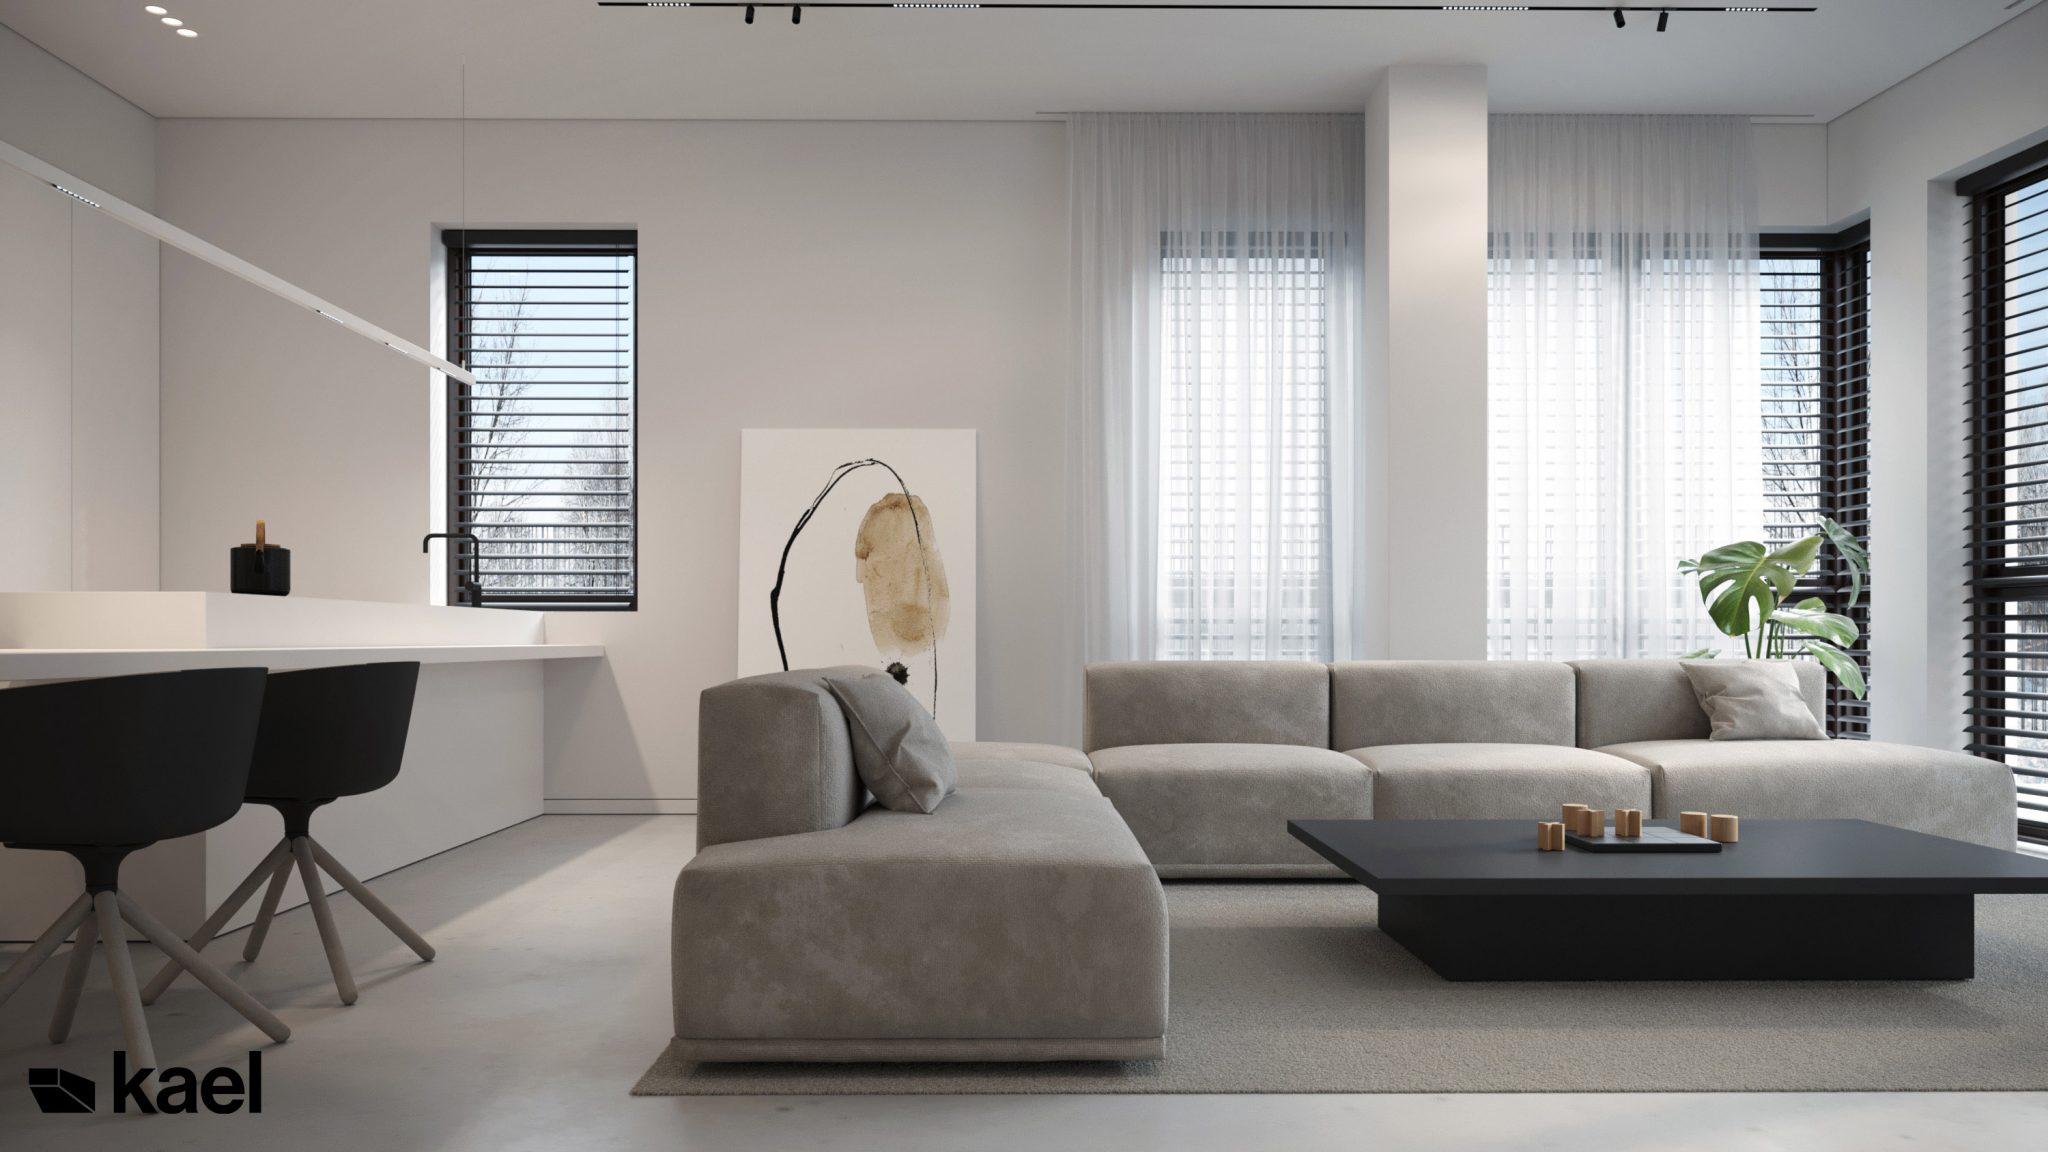 Salon - projekt Wielicka - Kael Architekci